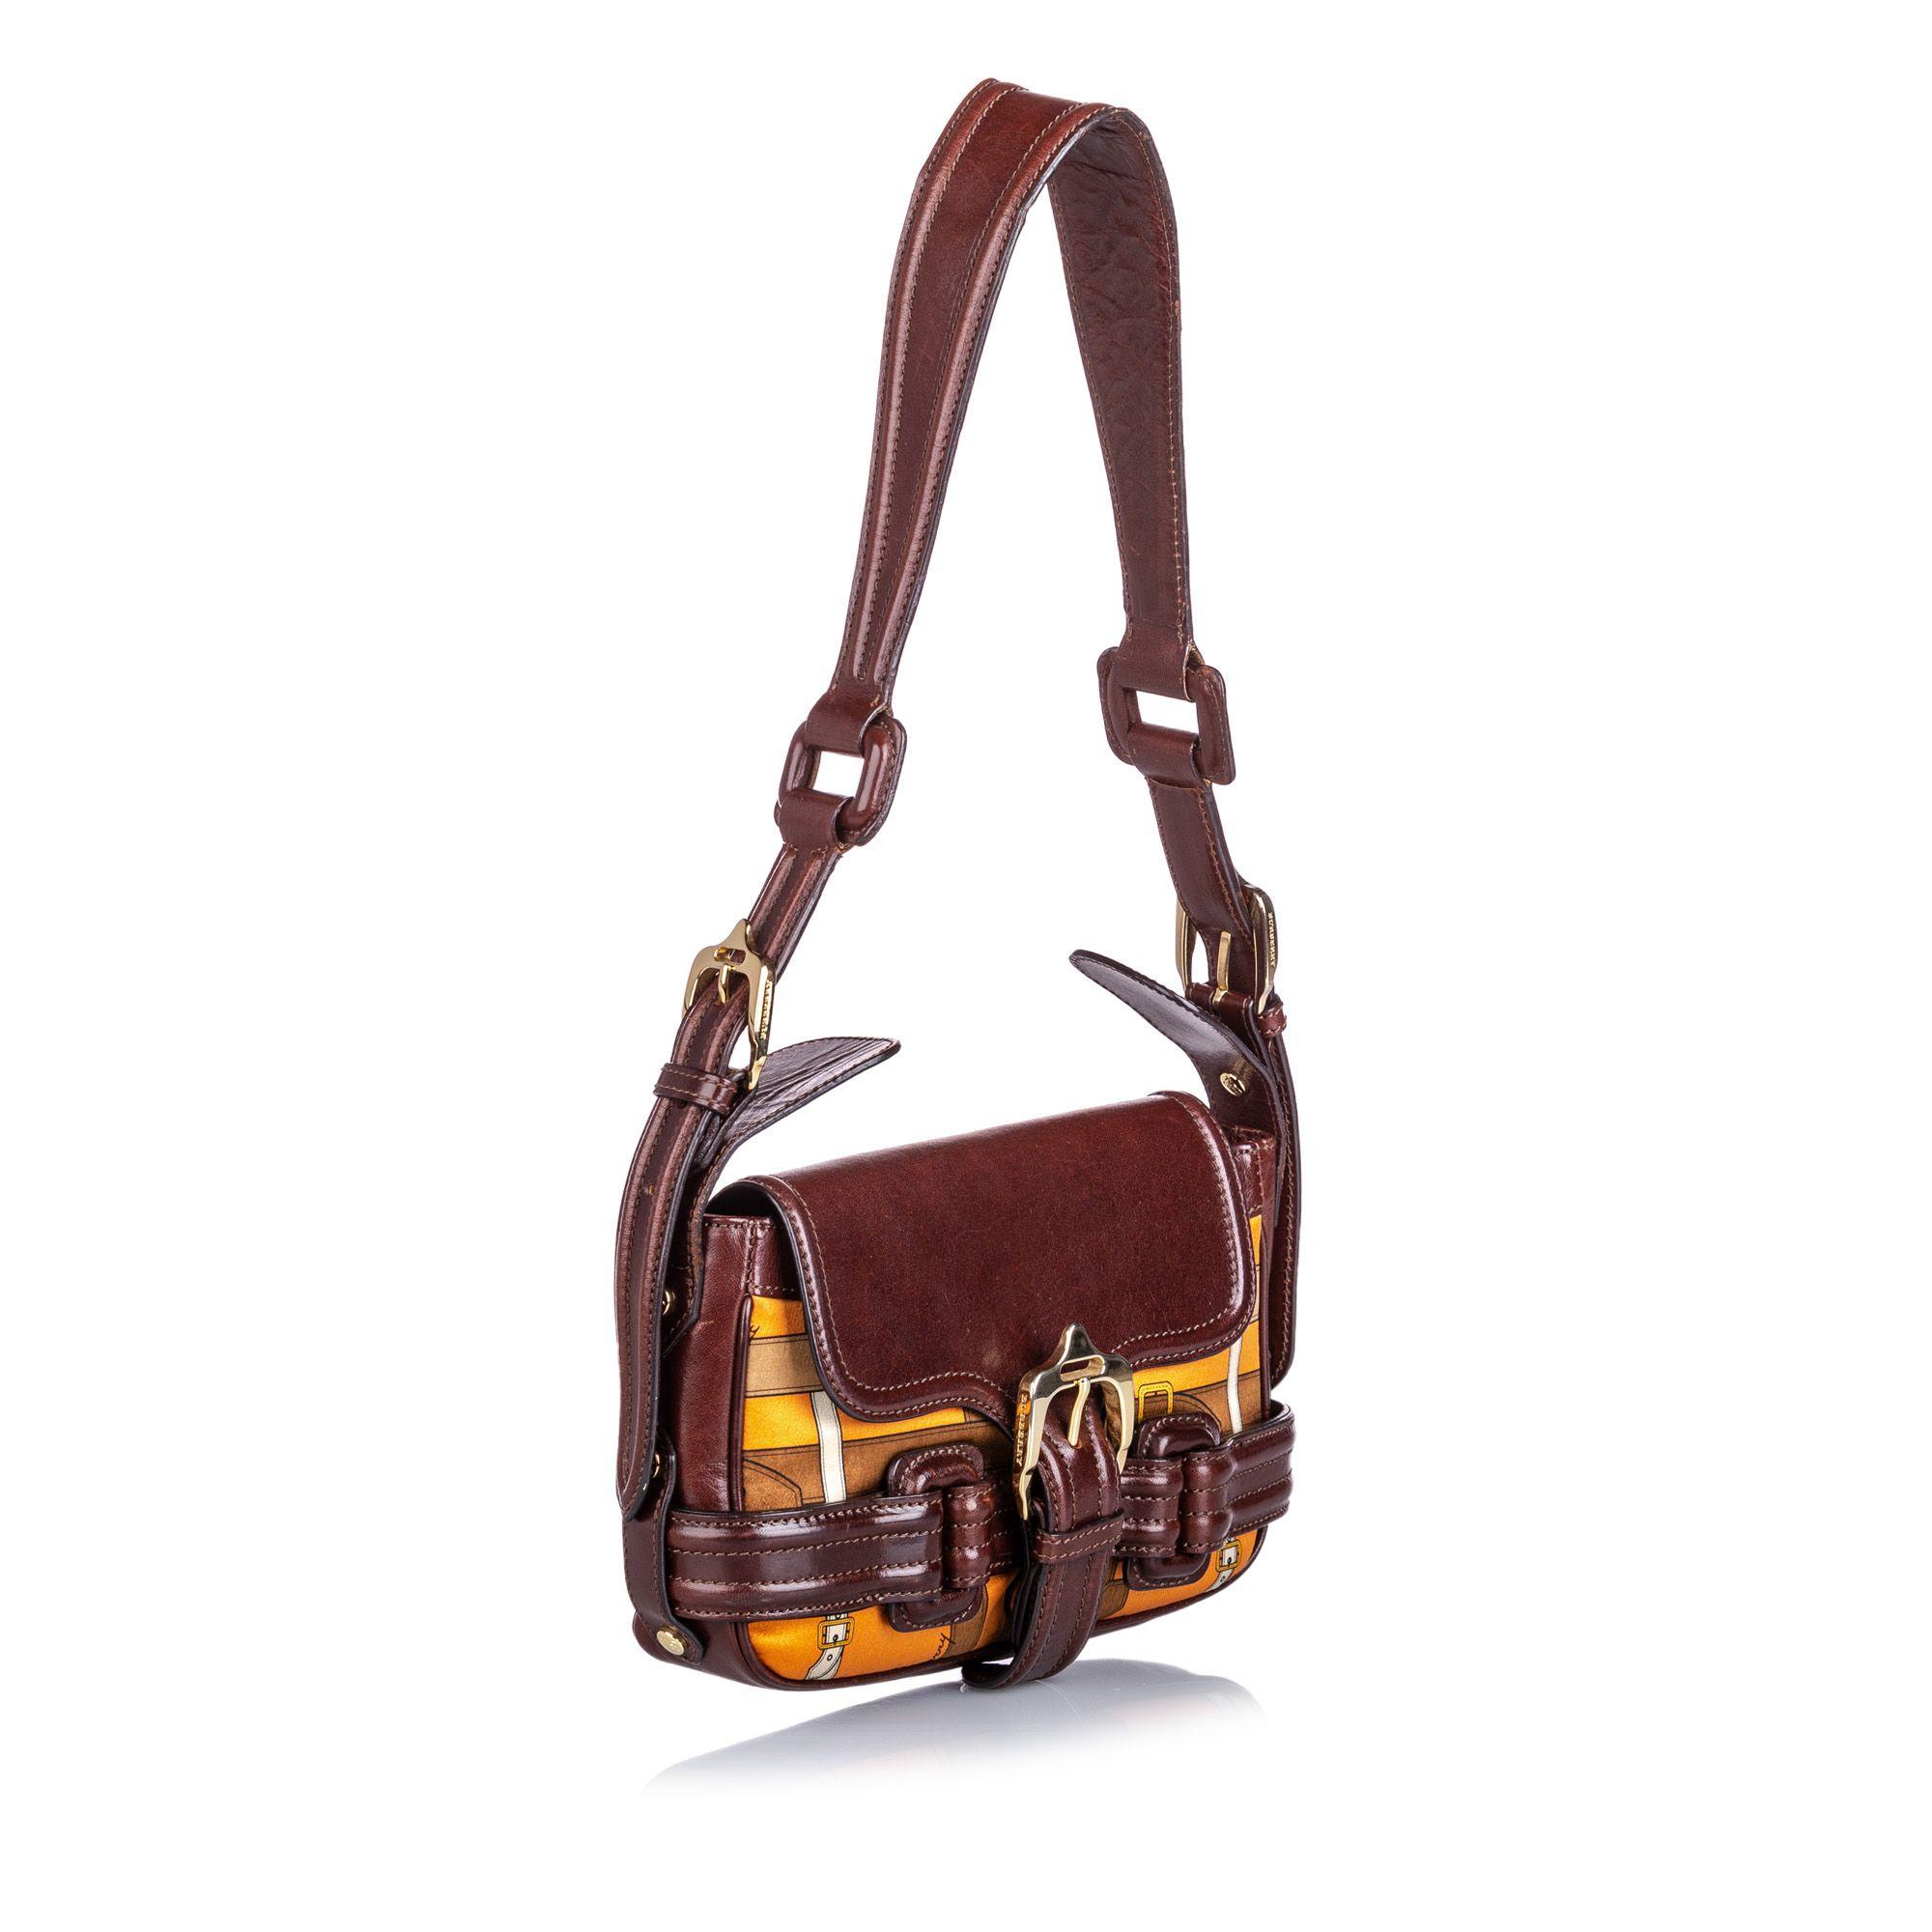 Vintage Burberry Printed Shoulder Bag Brown